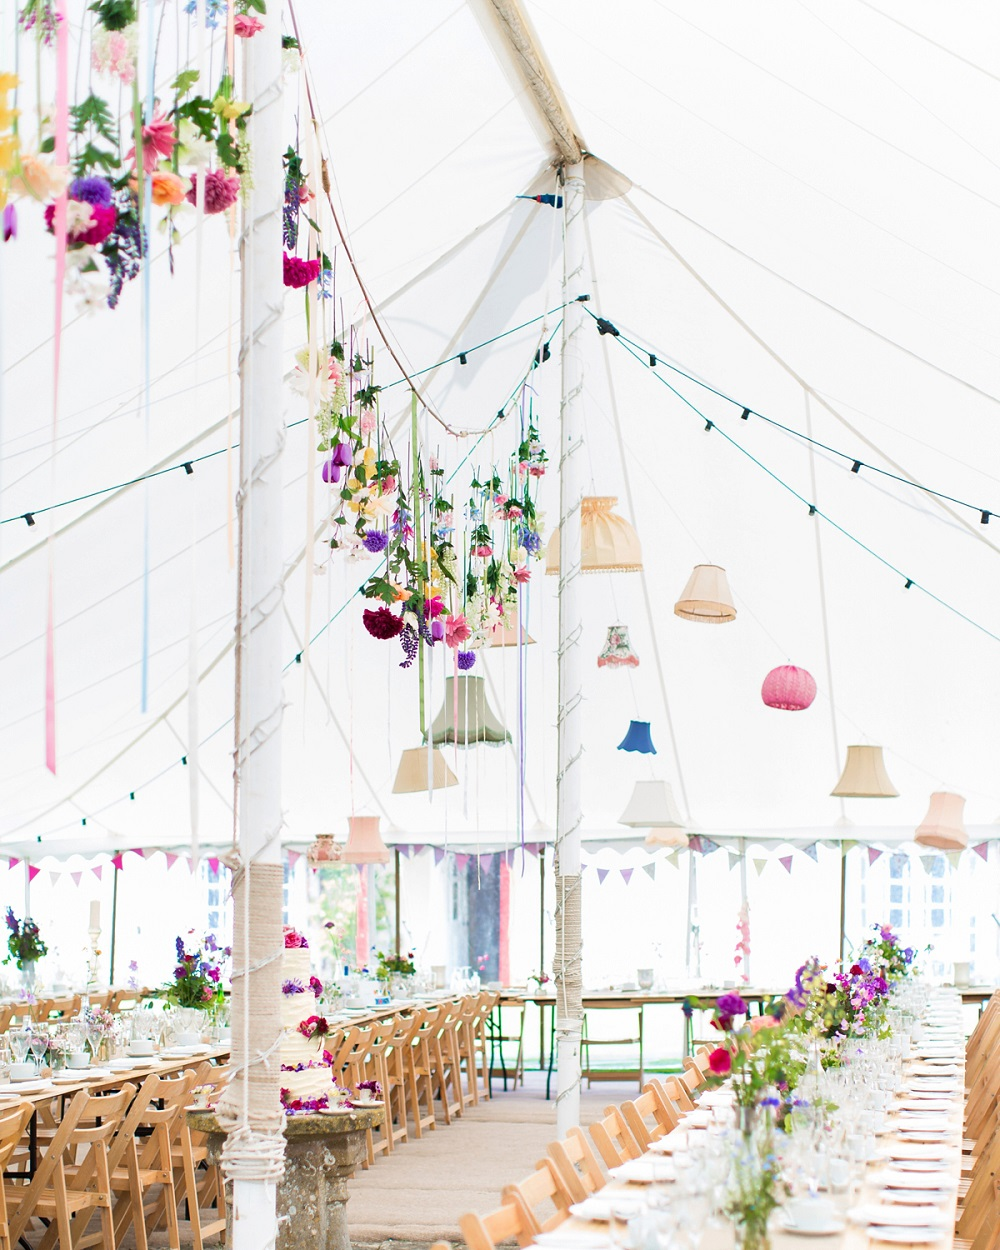 Festival bruiloft tent